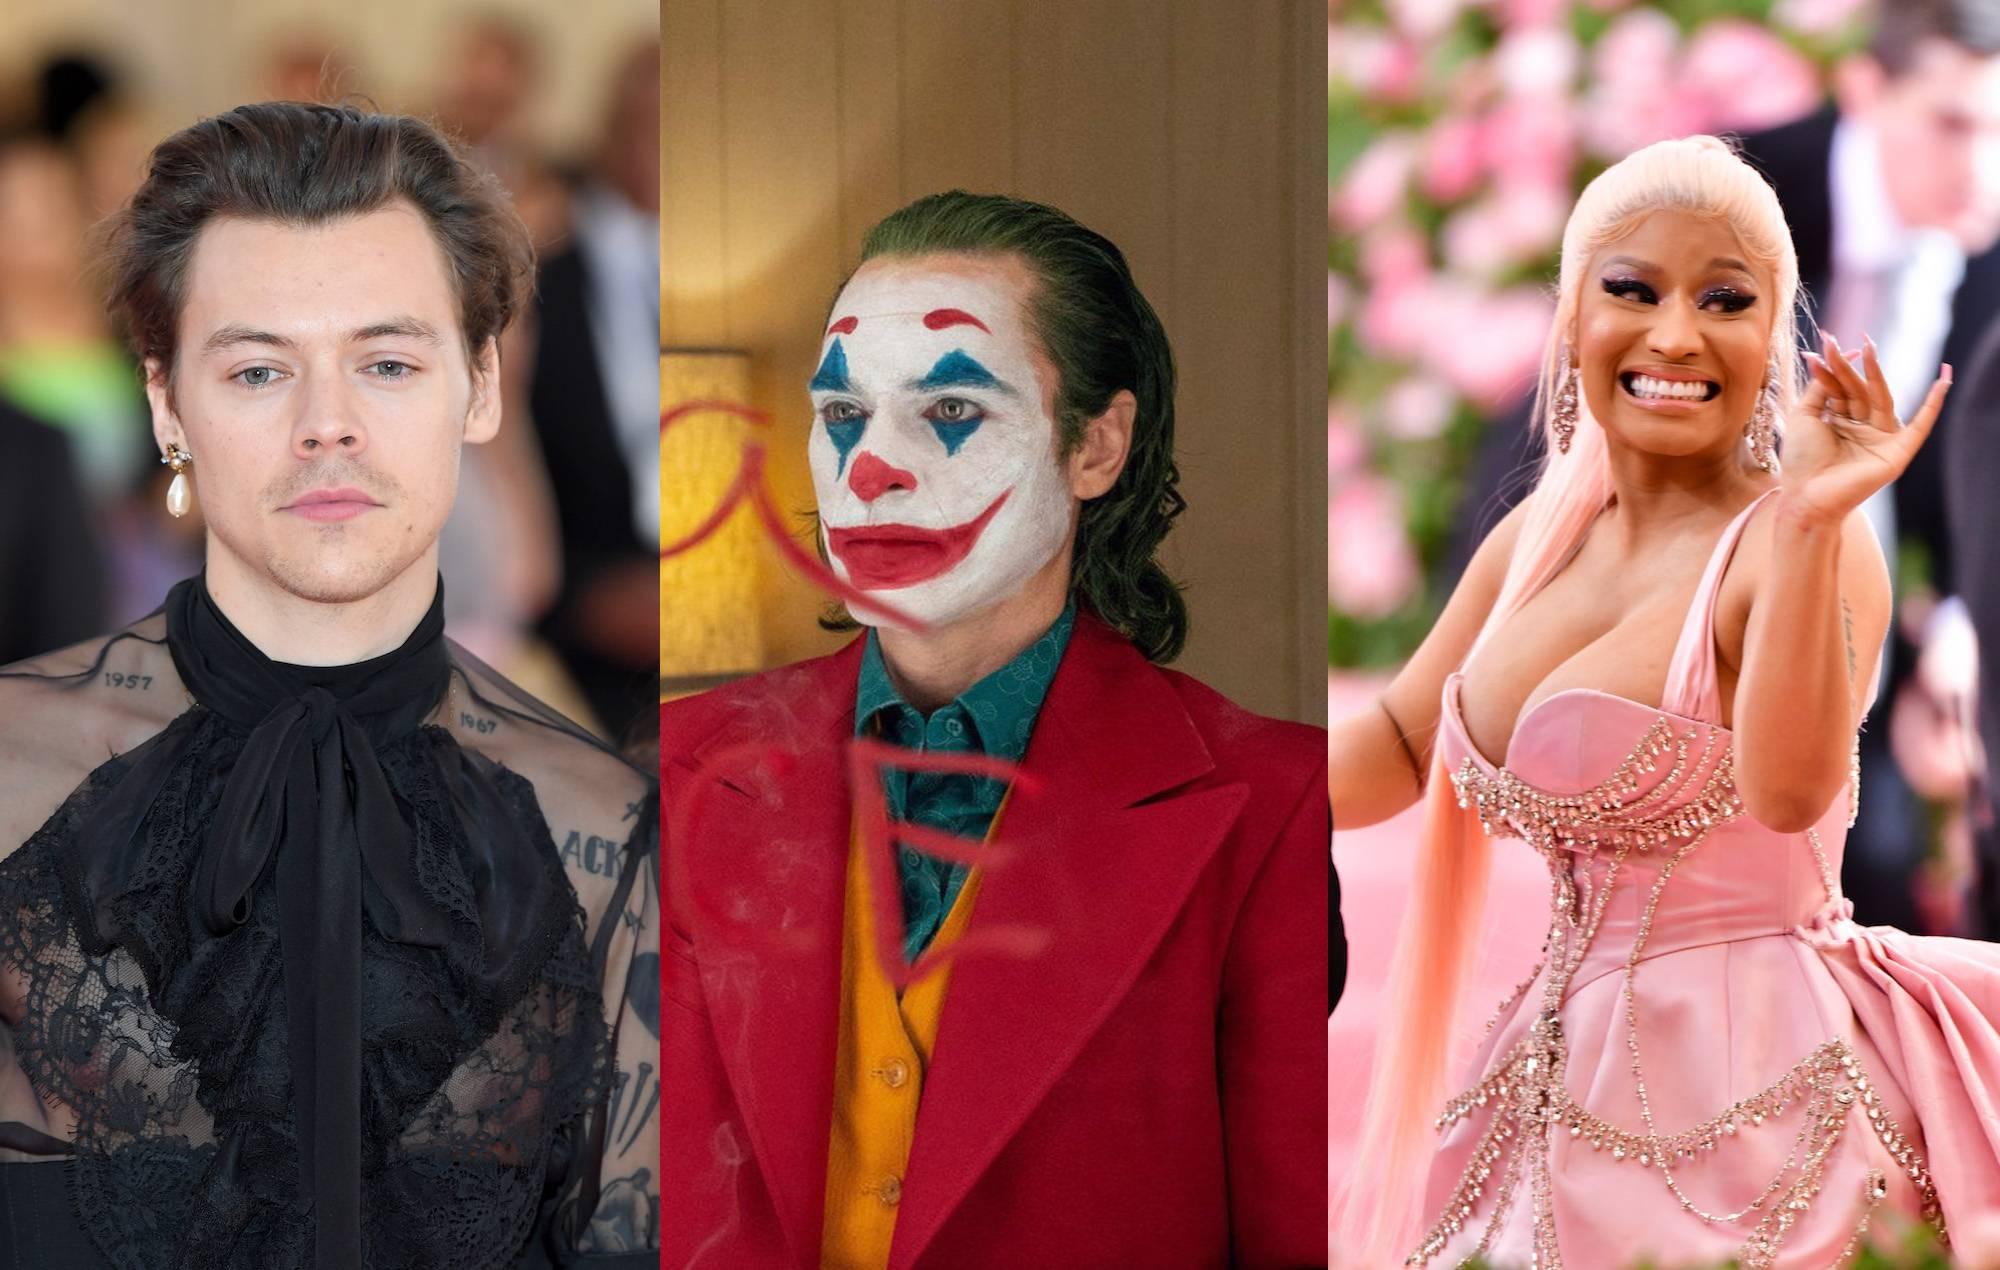 Harry Styles, Joaquin Phoenix as The Joker, Nicki Minaj